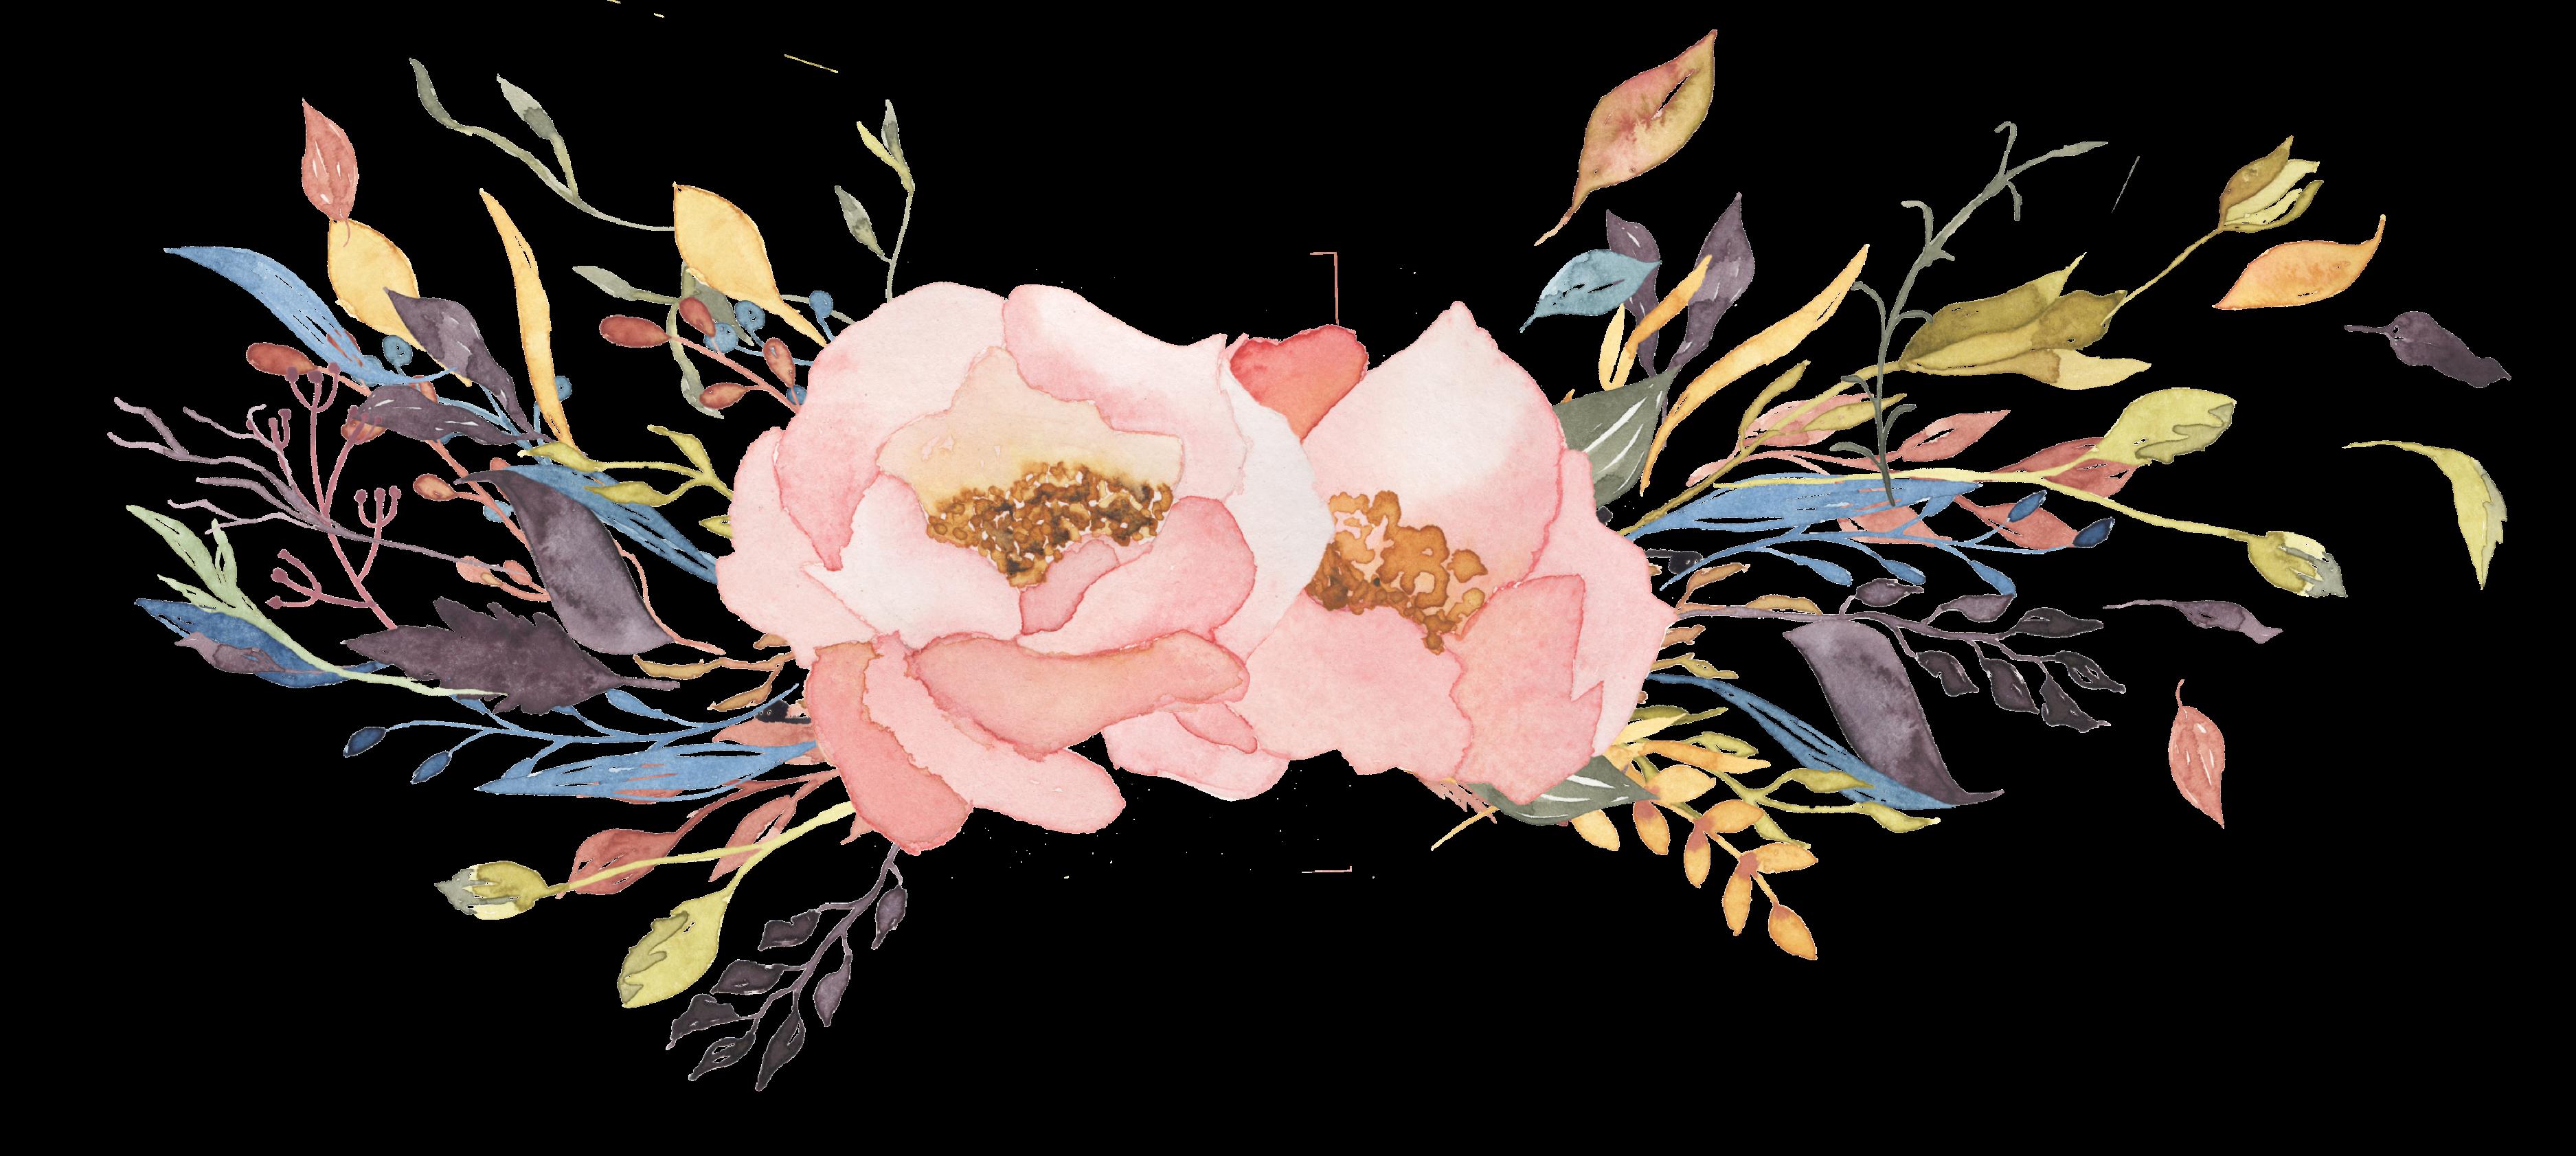 Flower Watercolor Art Transparent Background